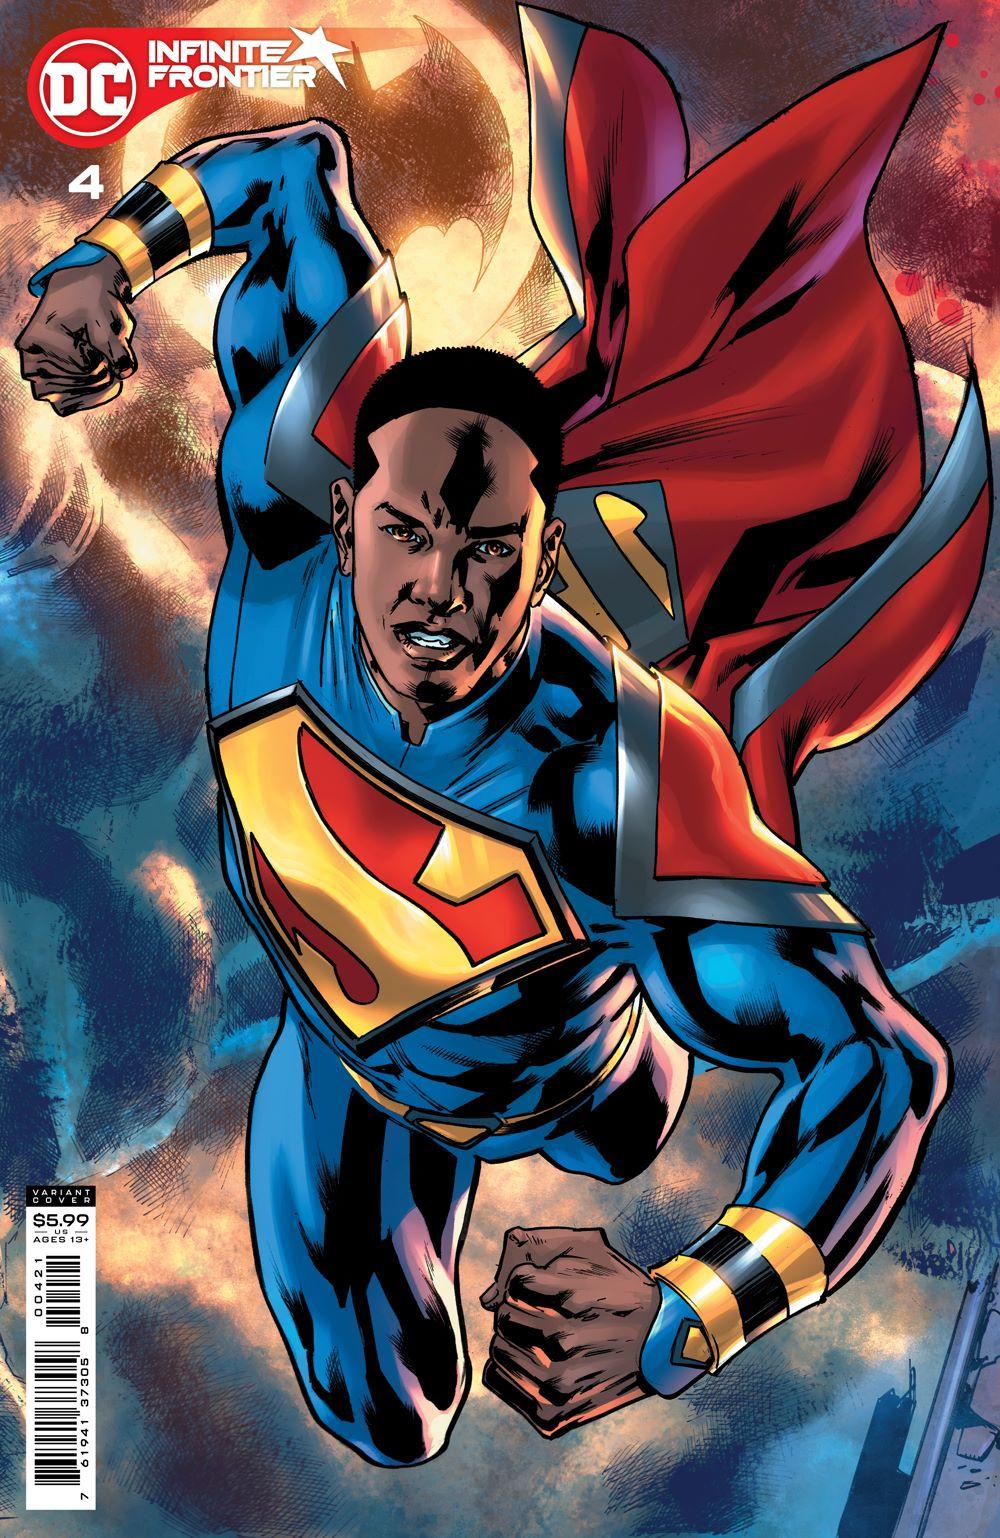 INFINITE_FRONTIER_Cv4_var DC Comics August 2021 Solicitations